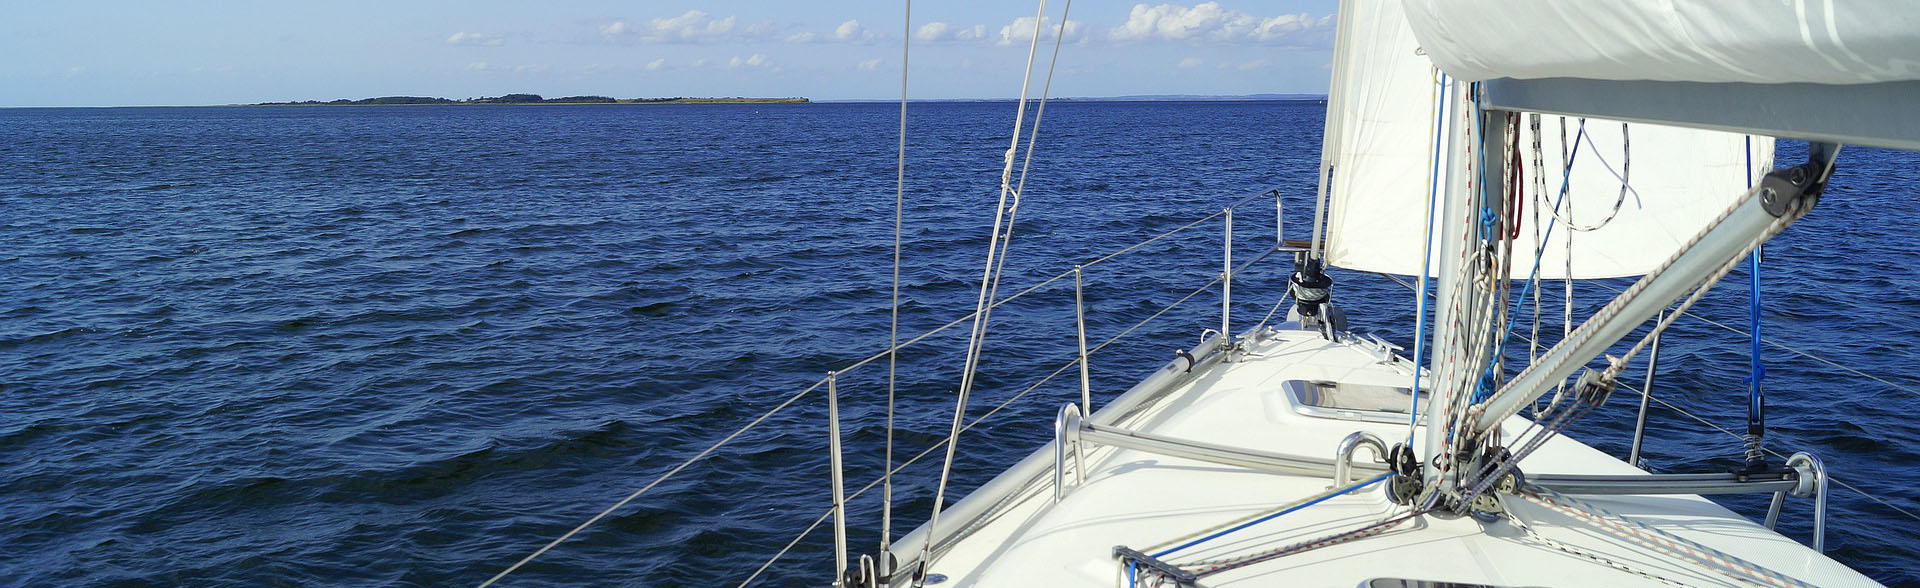 boat insurances